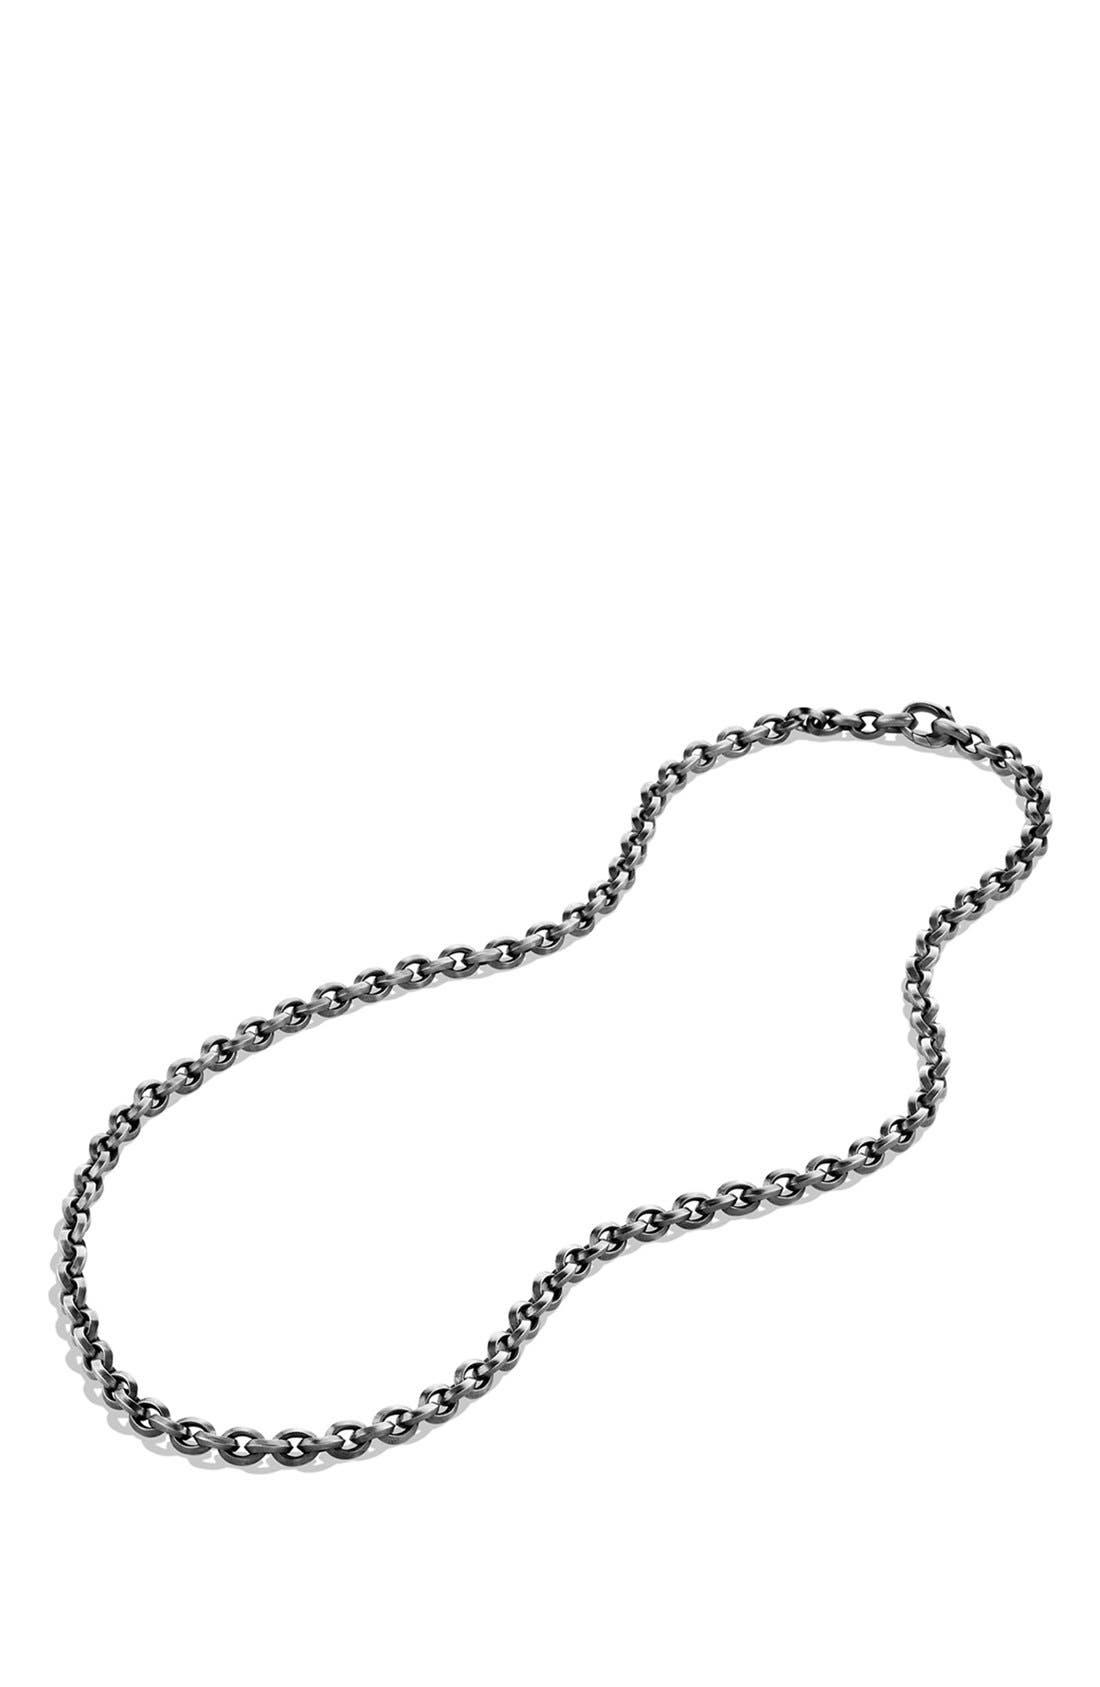 'Knife Edge' Chain Necklace,                             Alternate thumbnail 2, color,                             040